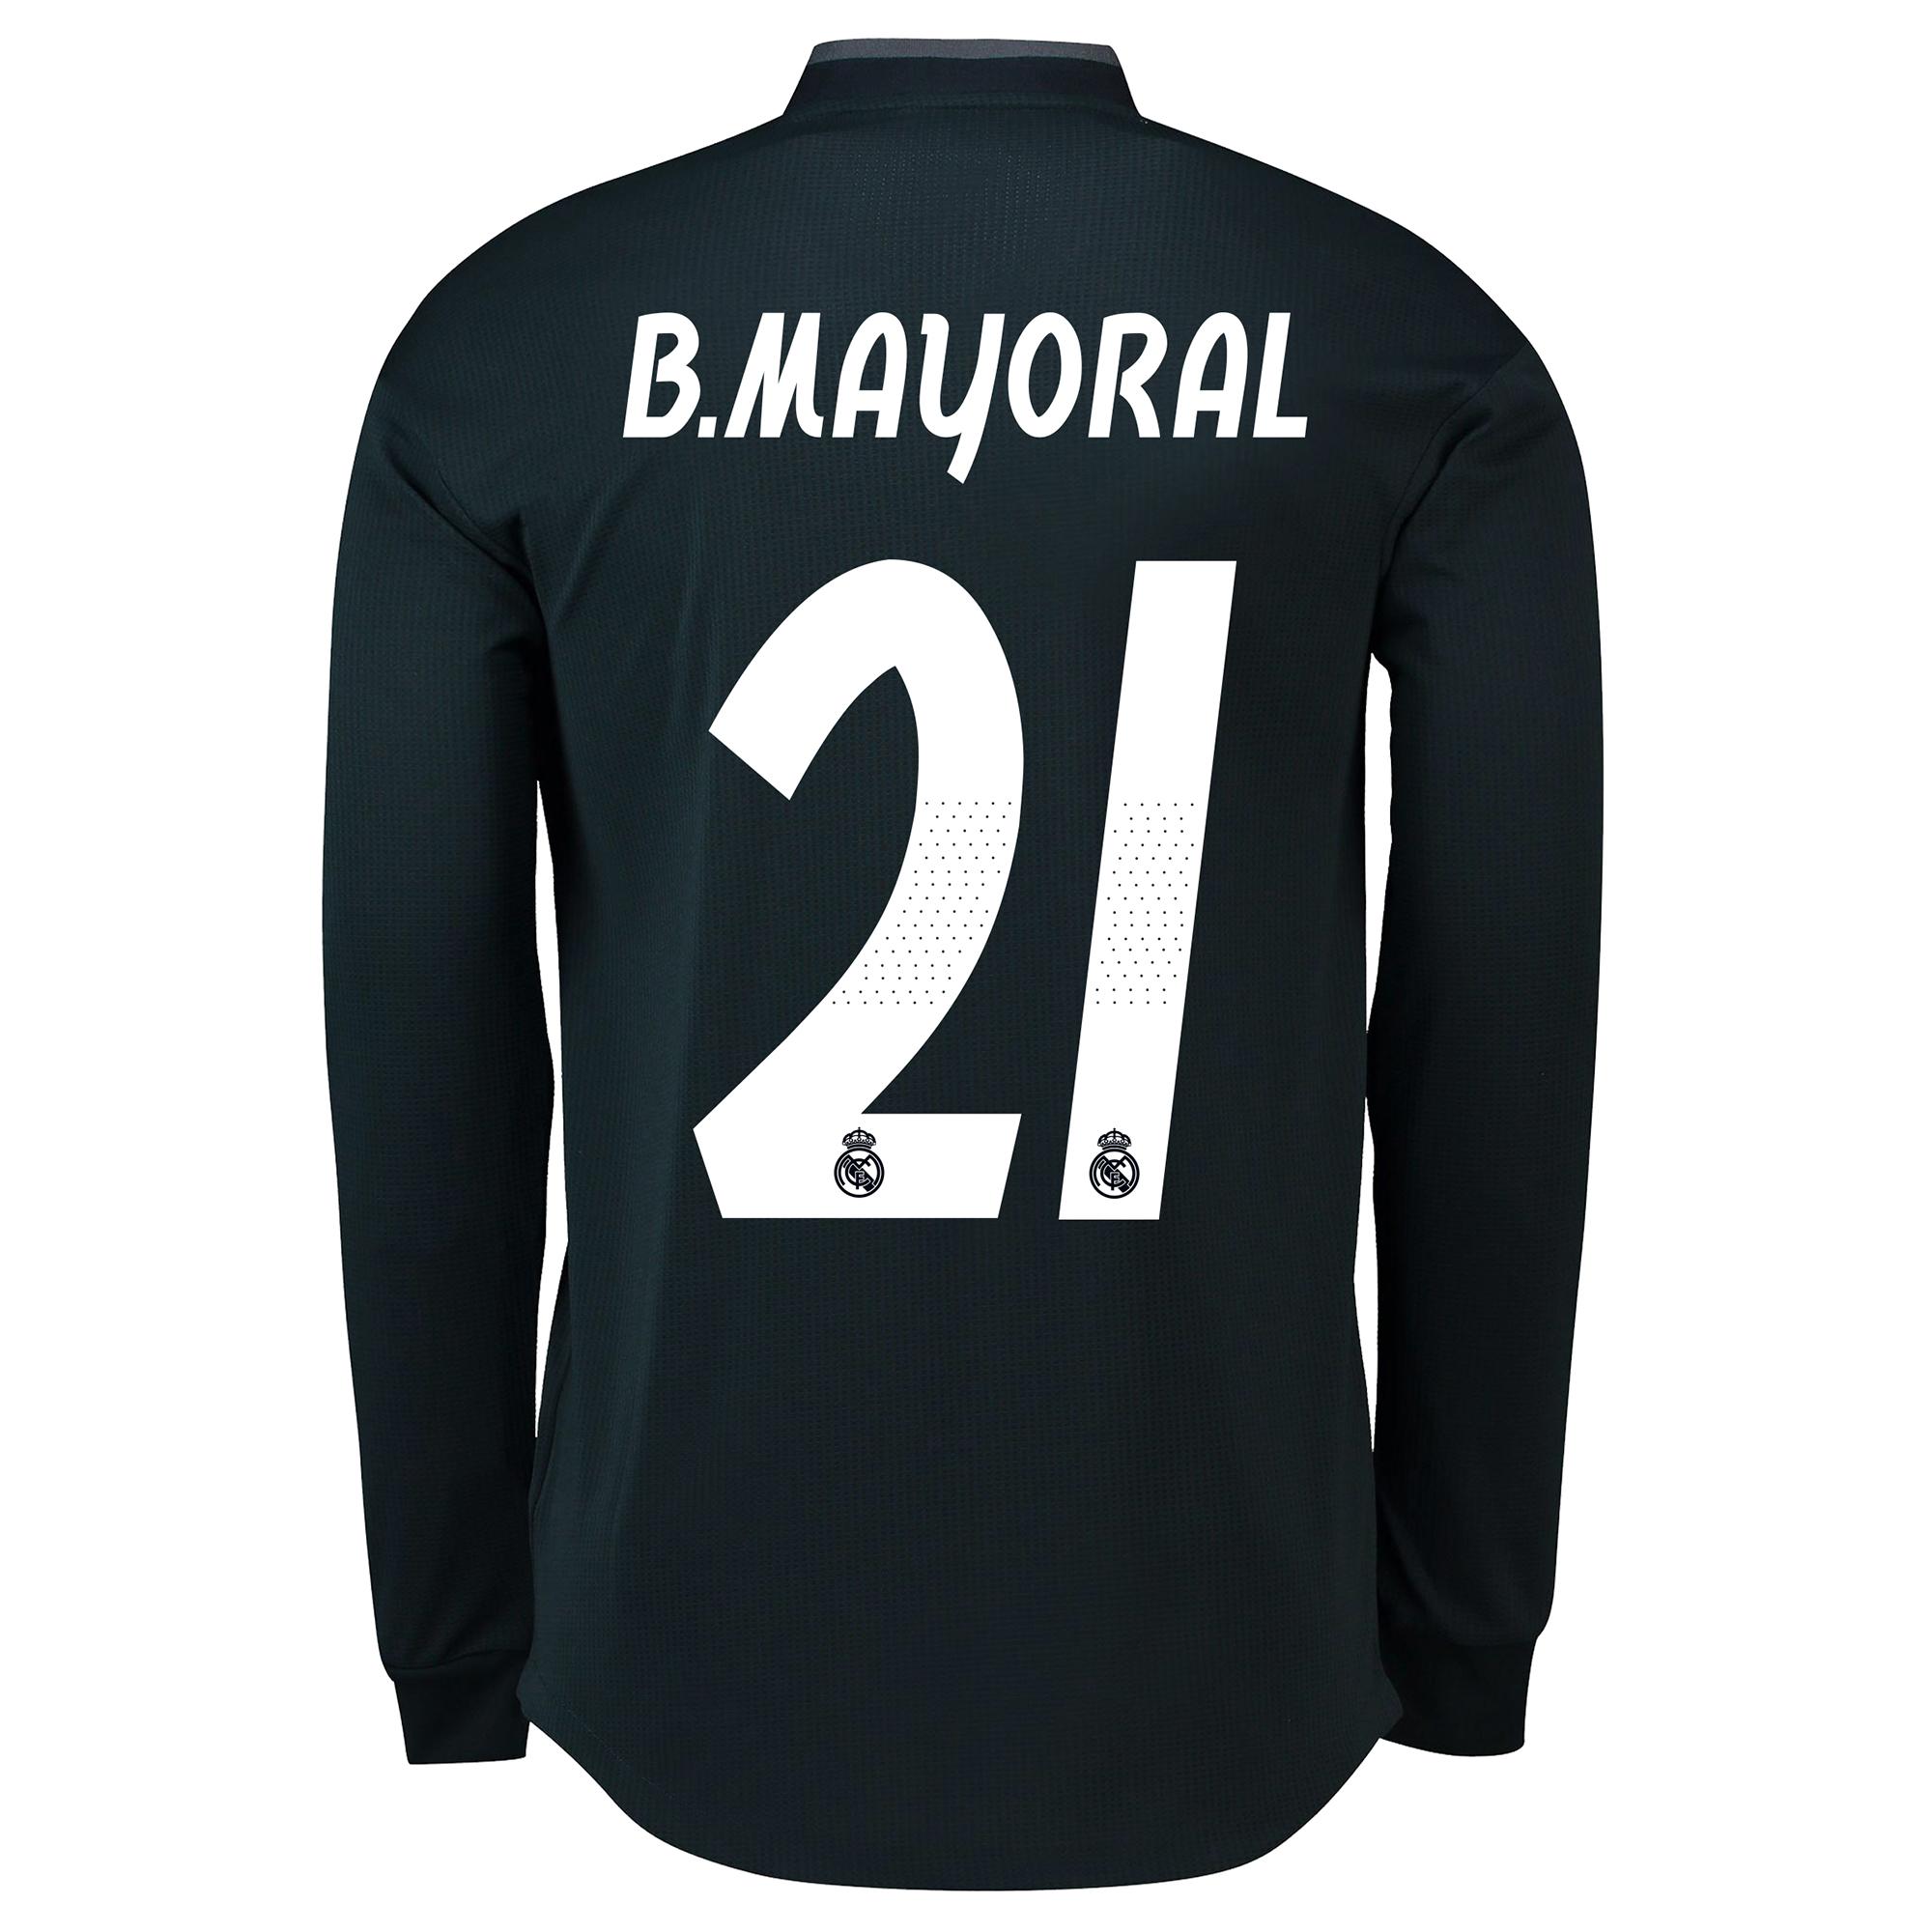 Image of Real Madrid Away Adi Zero Shirt 2018-19 - Long Sleeve with B. Mayoral 21 printing